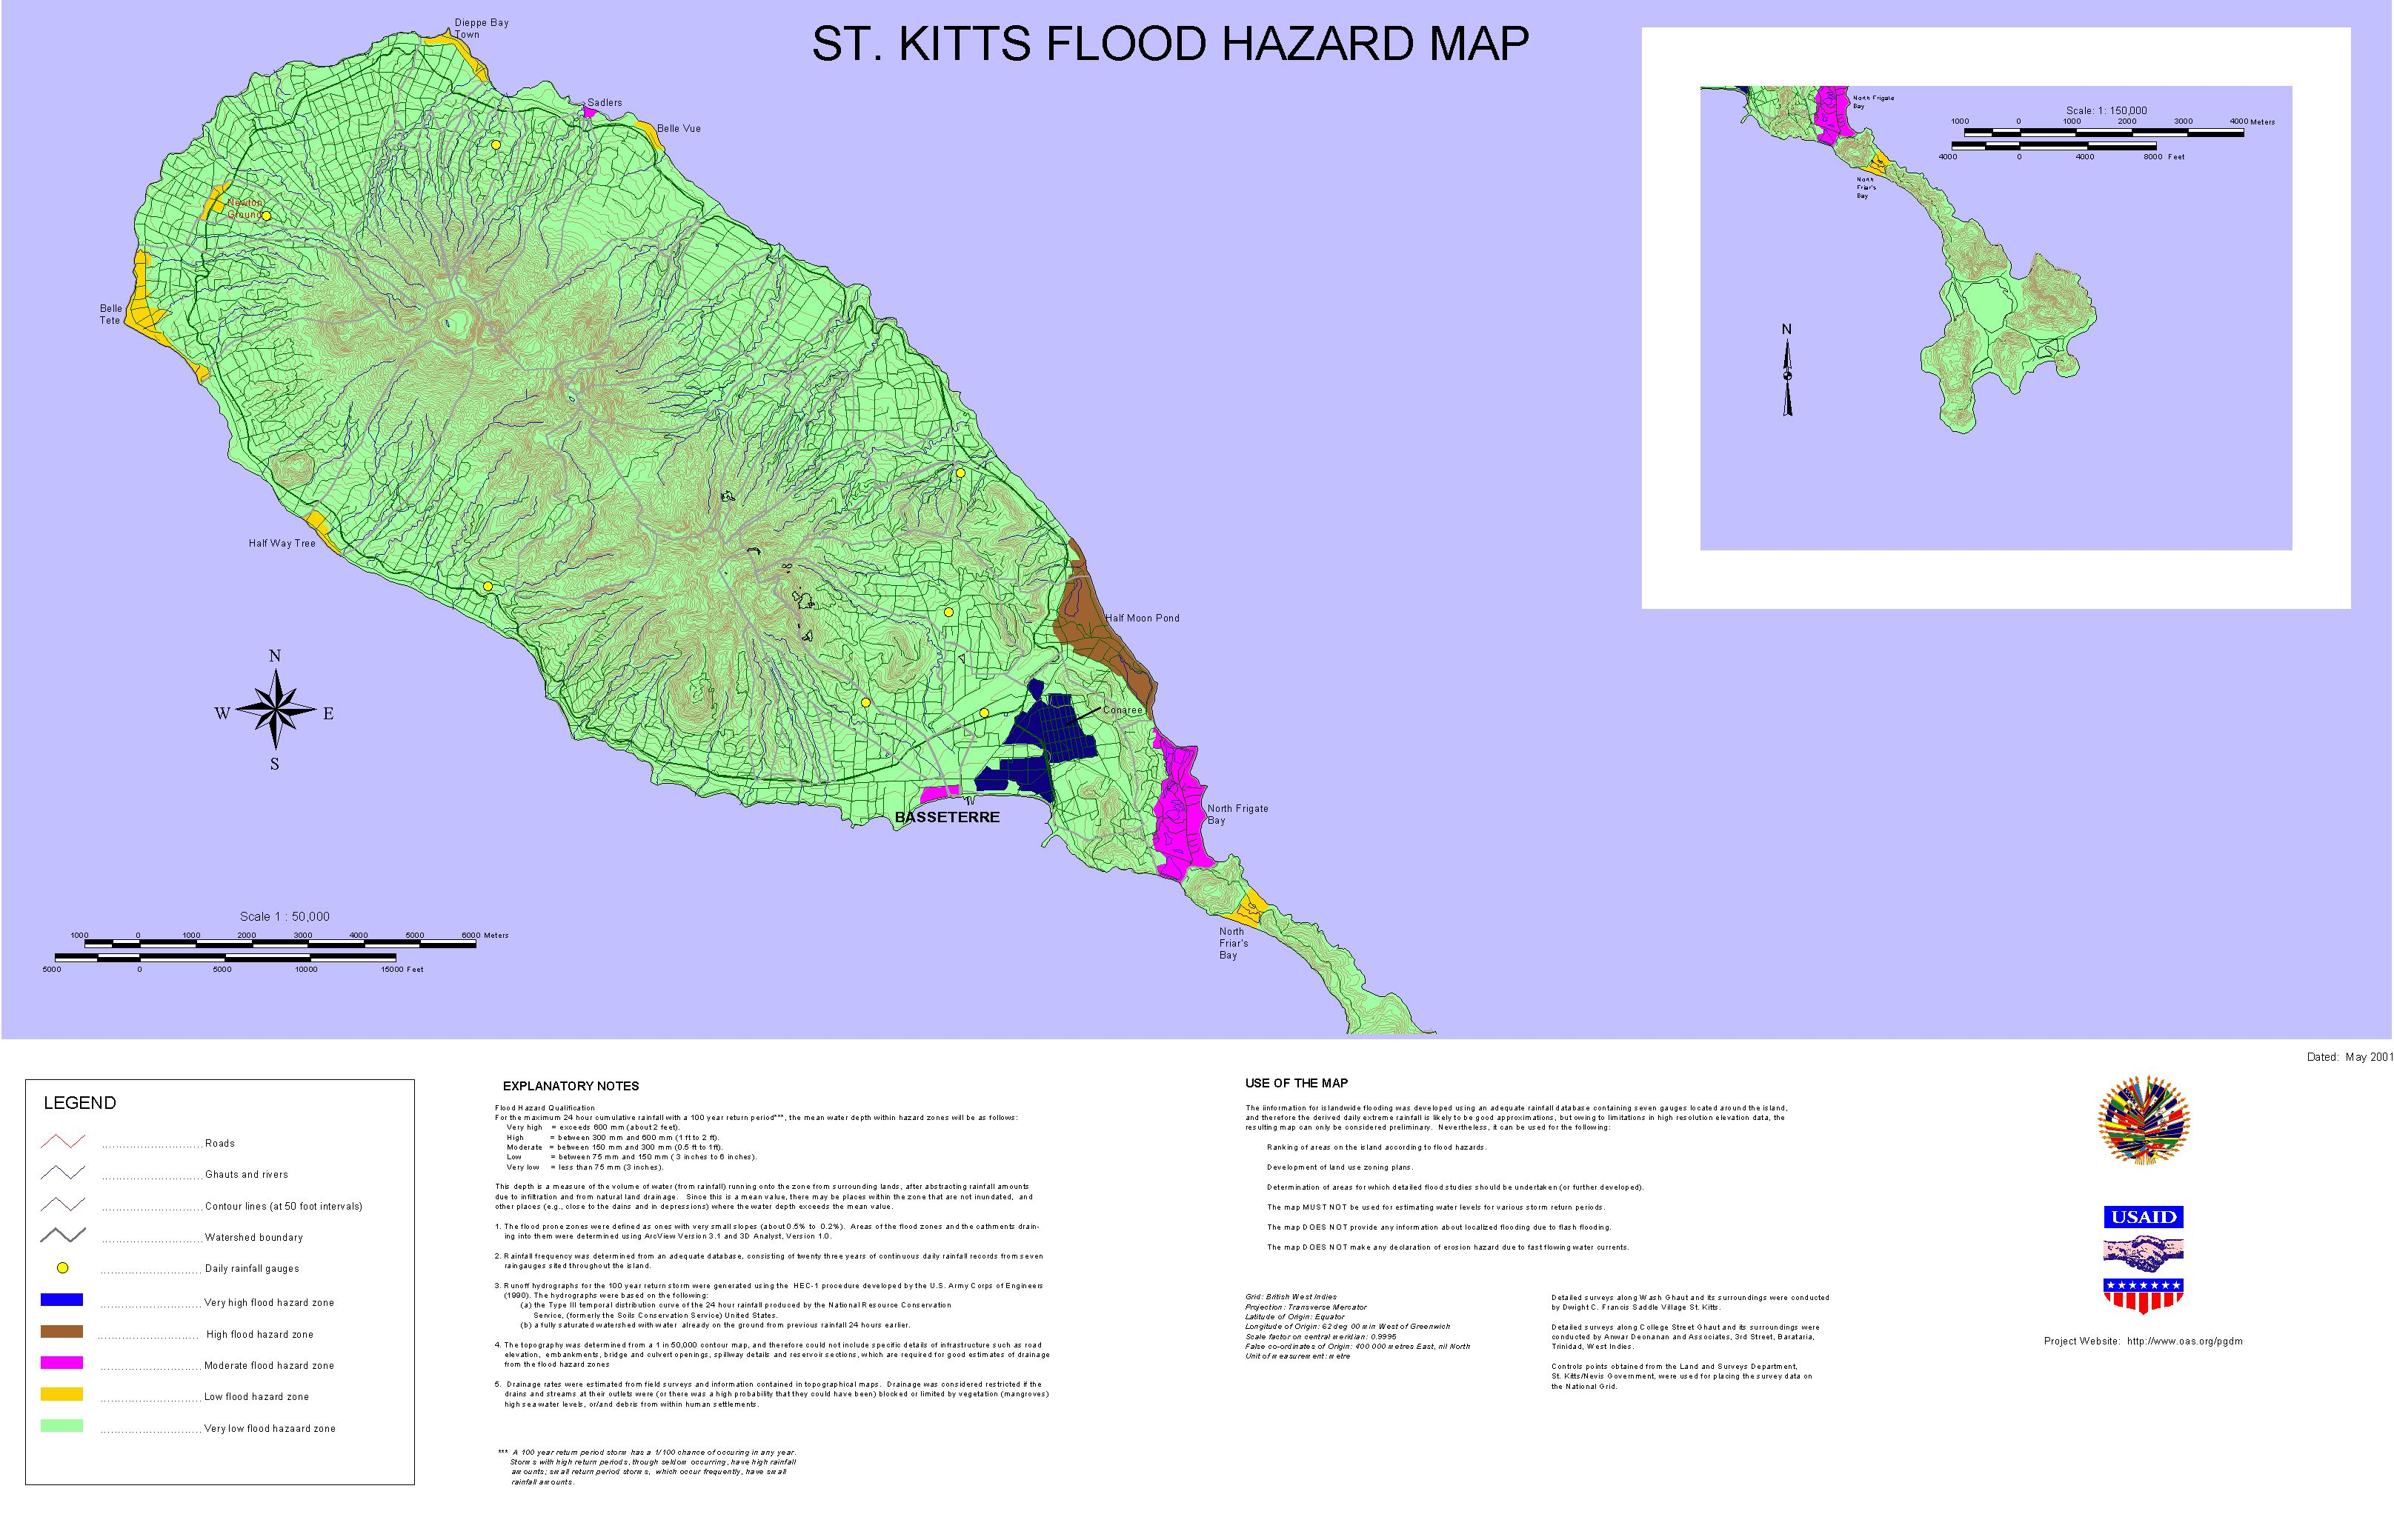 PGDM Inland Flooding Hazard Map: St. Kitts